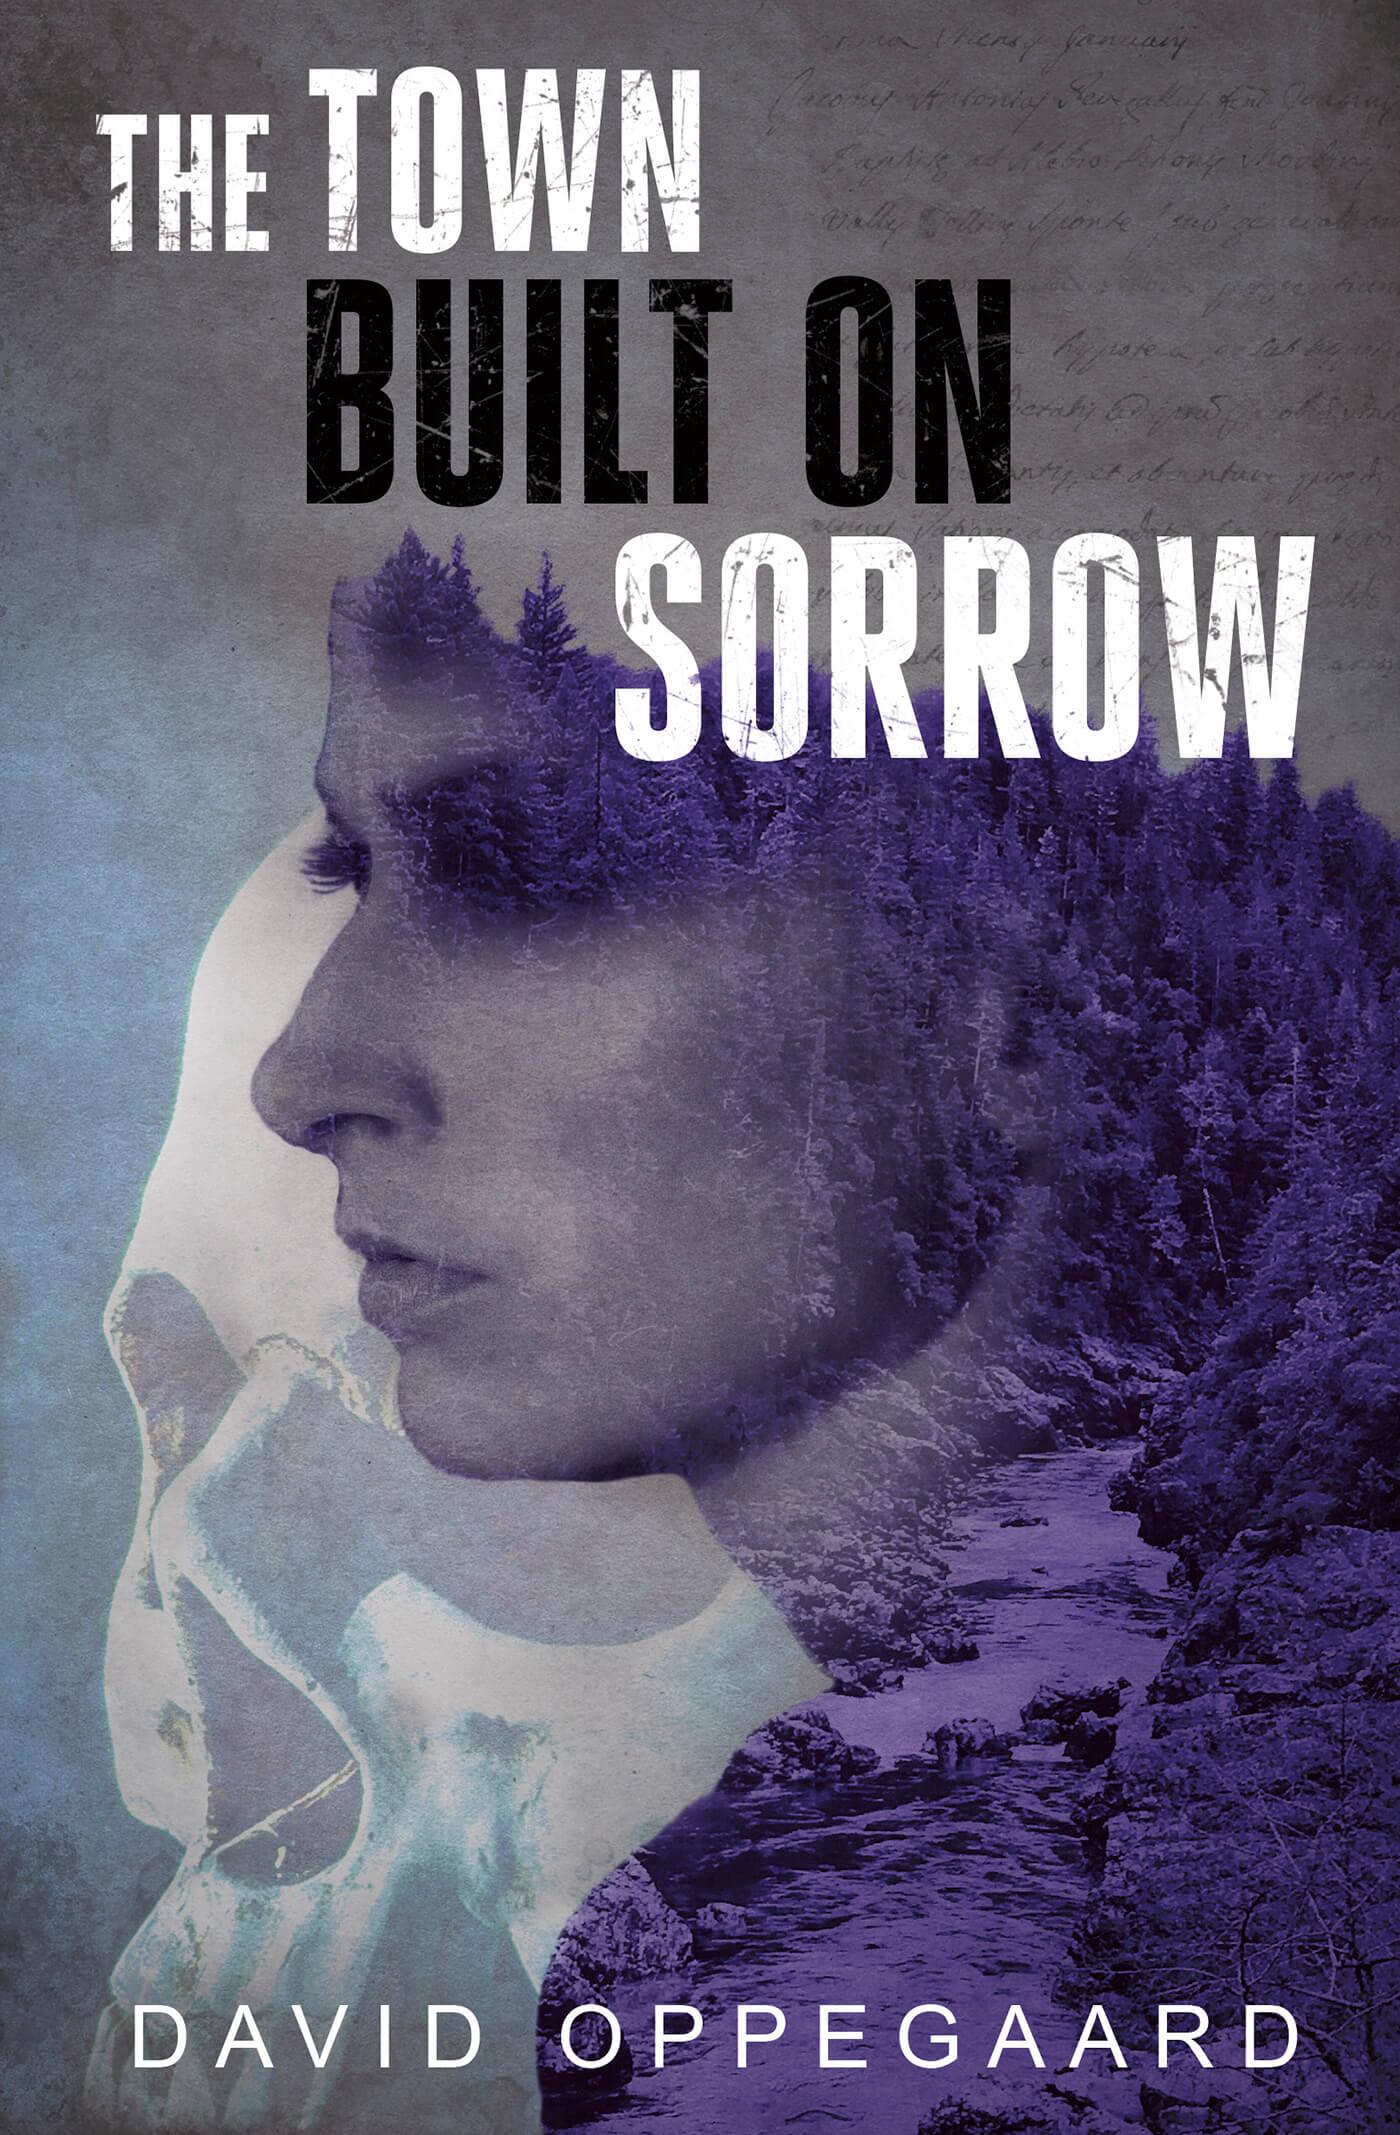 town-built-on-sorrow-david-oppegaard